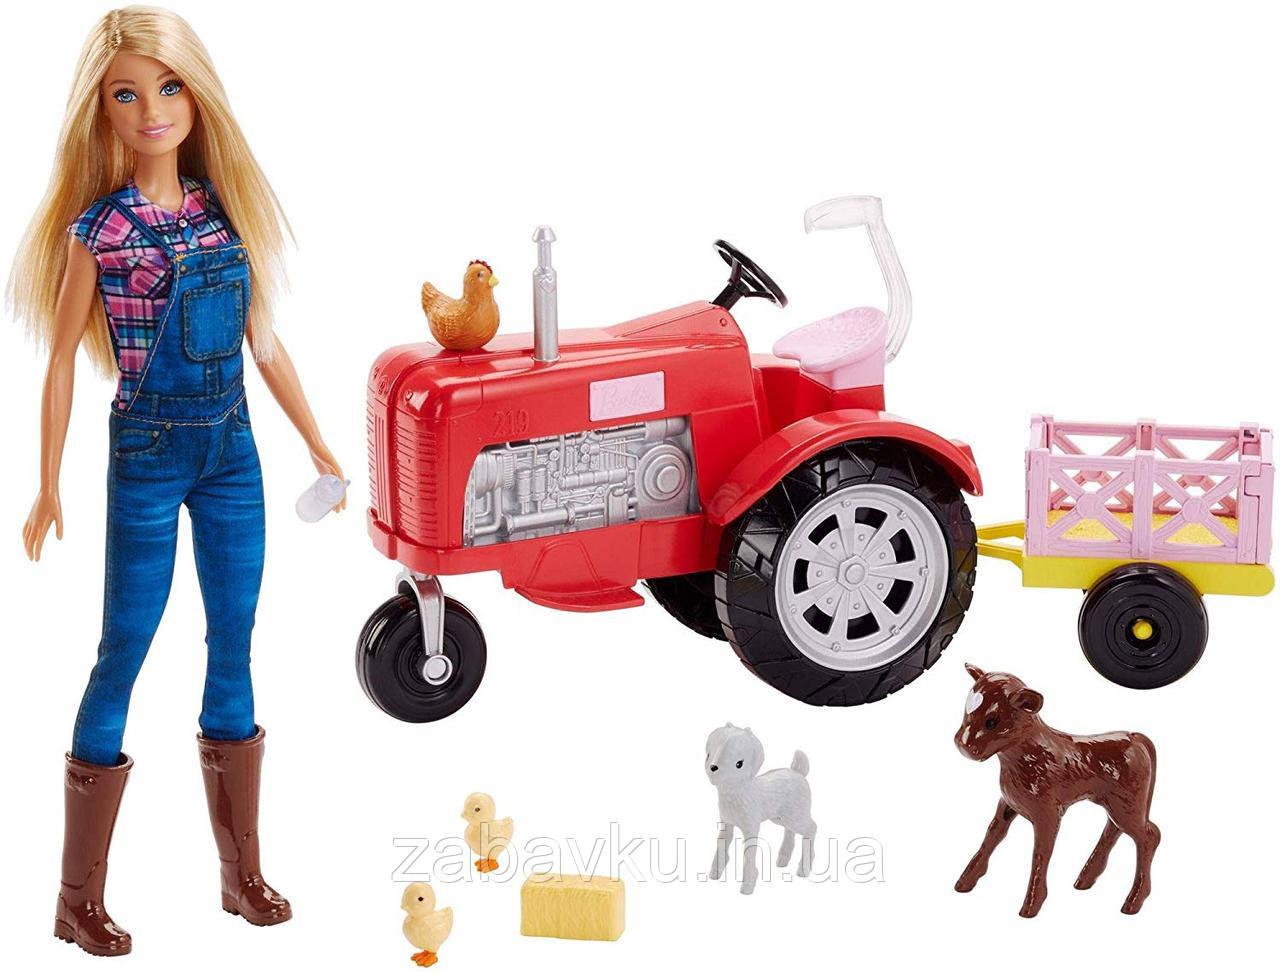 Набір лялька Барбі фермер на тракторі Barbie Doll and Tractor